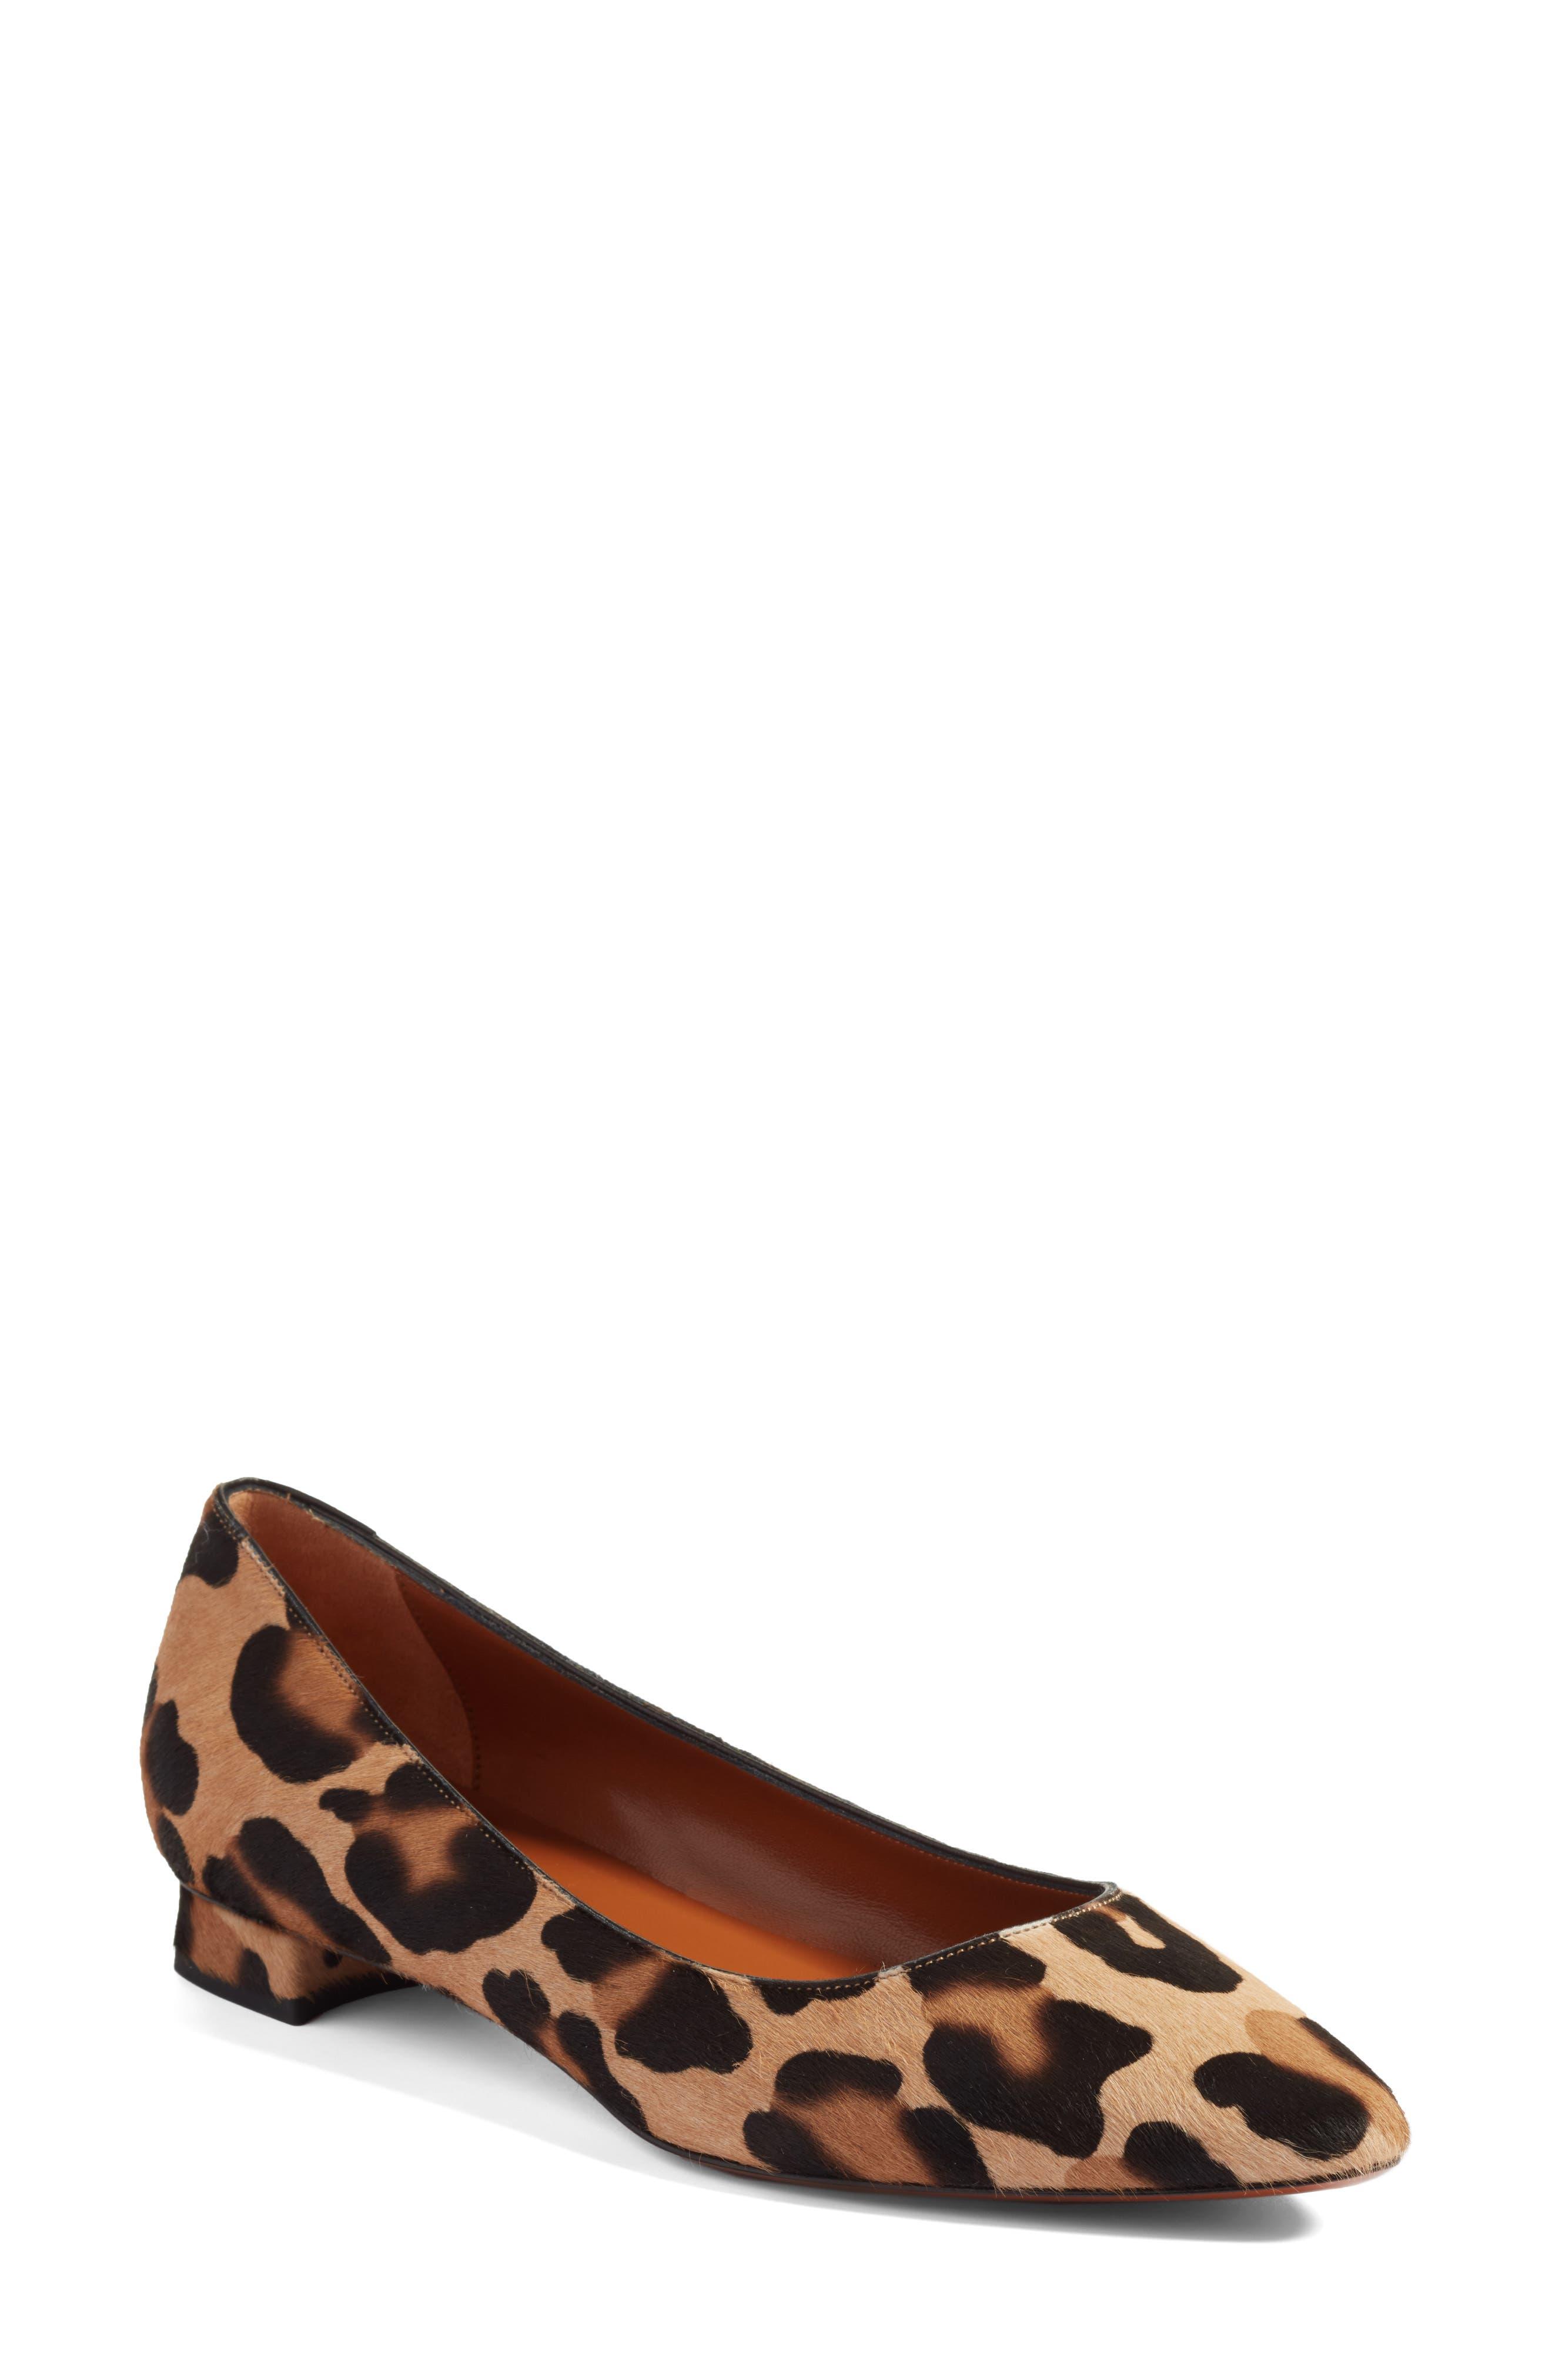 Alternate Image 1 Selected - Aquatalia Perla Weatherproof Genuine Calf Hair Ballerina Shoe (Women)